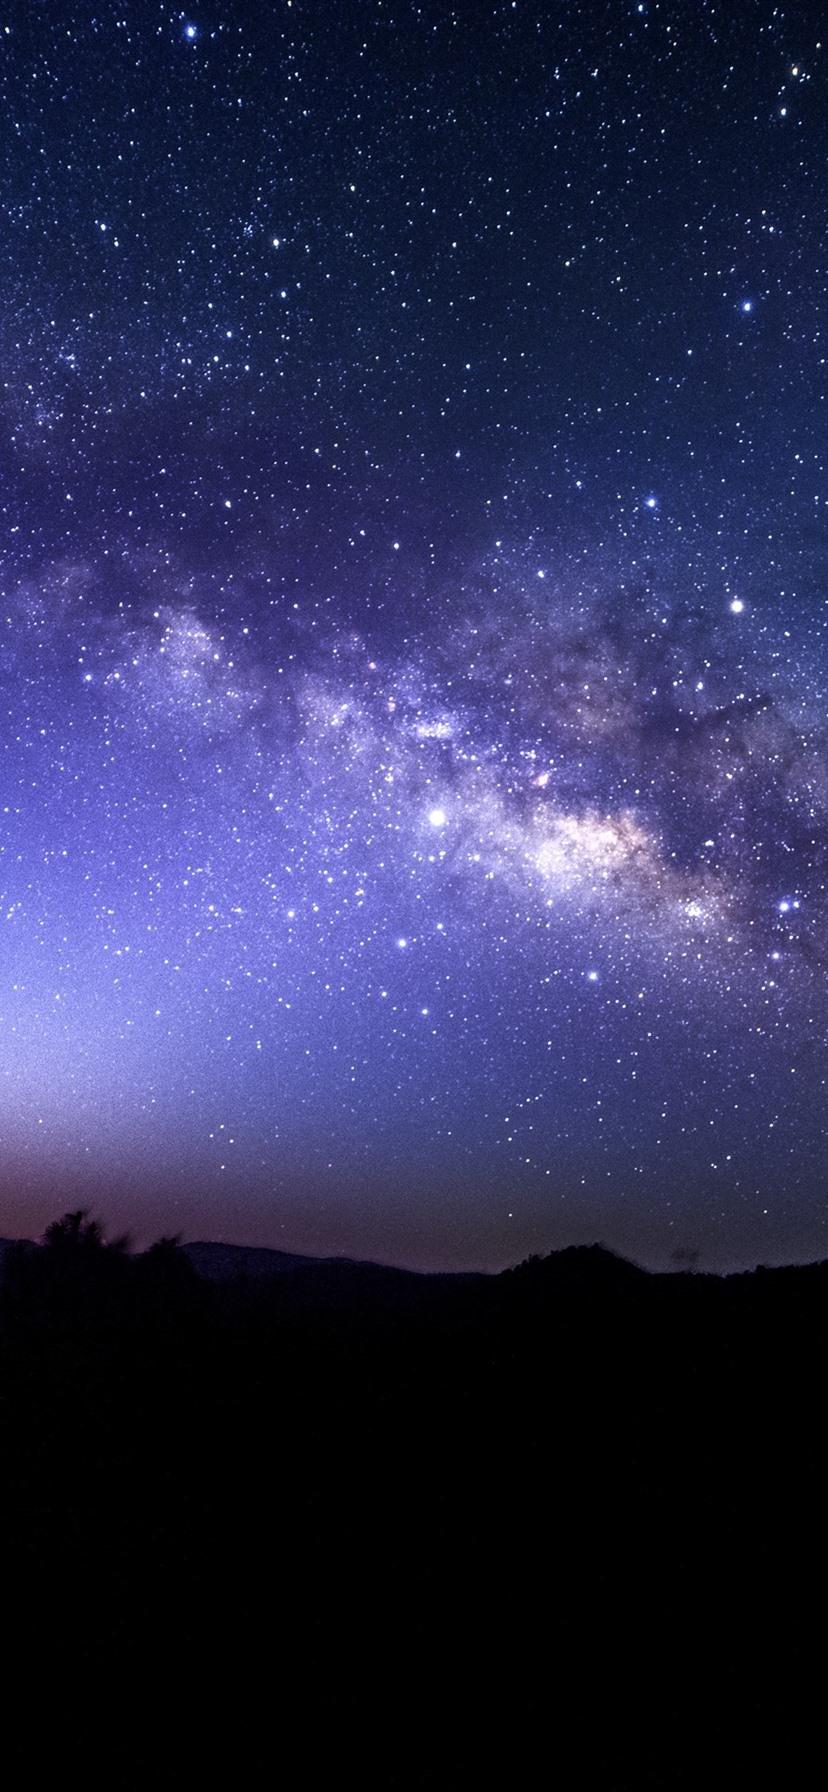 Wallpaper Starry Sky Stars Night 5120x2880 Uhd 5k Picture Image